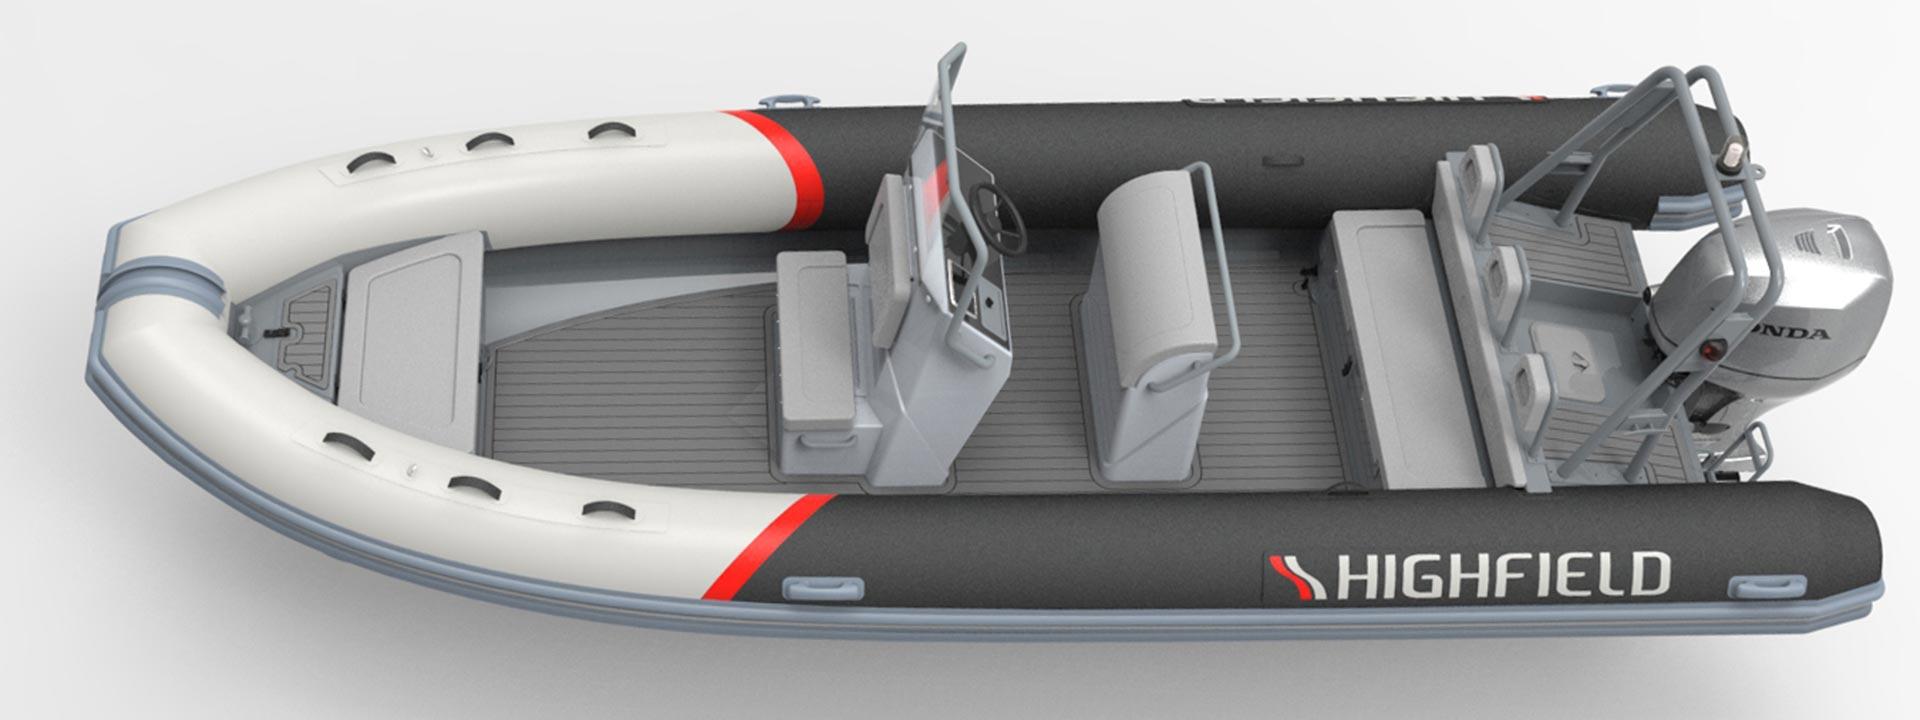 mayer-charter-boat-header-highfield-640-dl-04